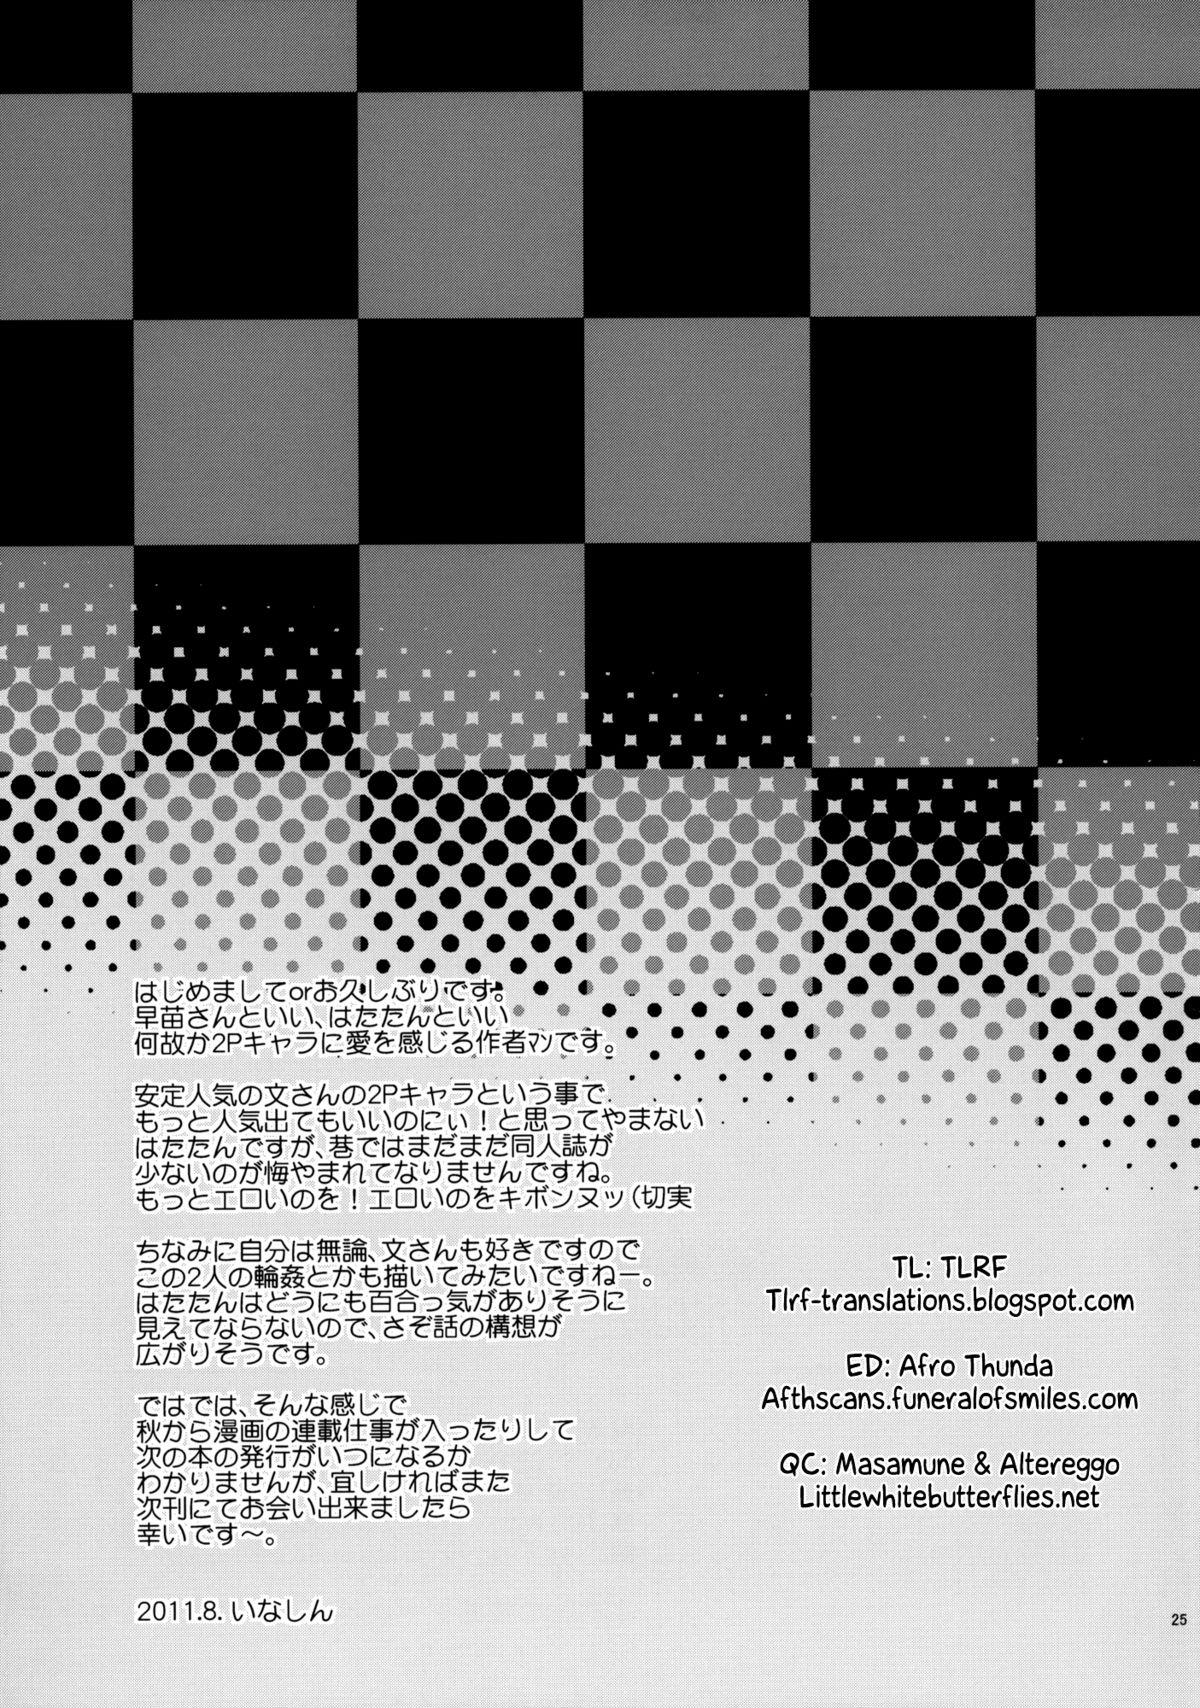 Hatate no Binwan Shuzairoku | Record of Hatate's Competent Fact-Finding 23